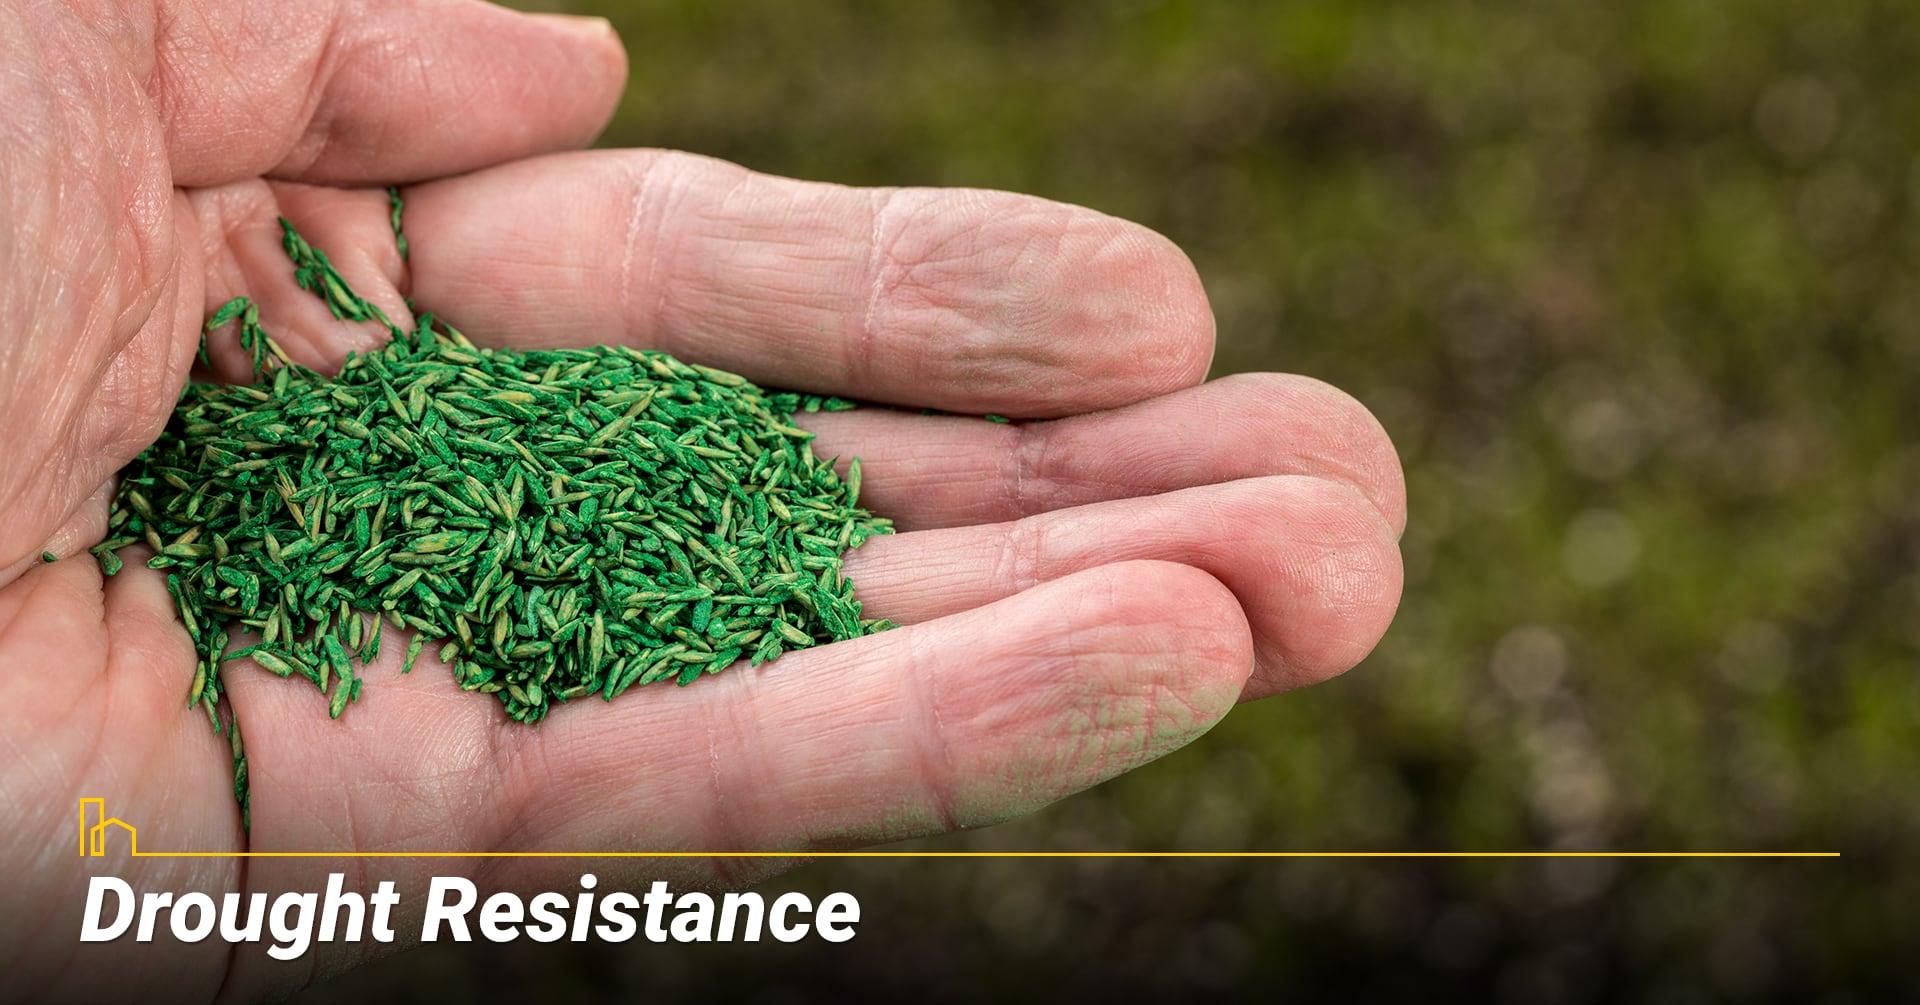 Drought Resistance, grow drought resistance grass